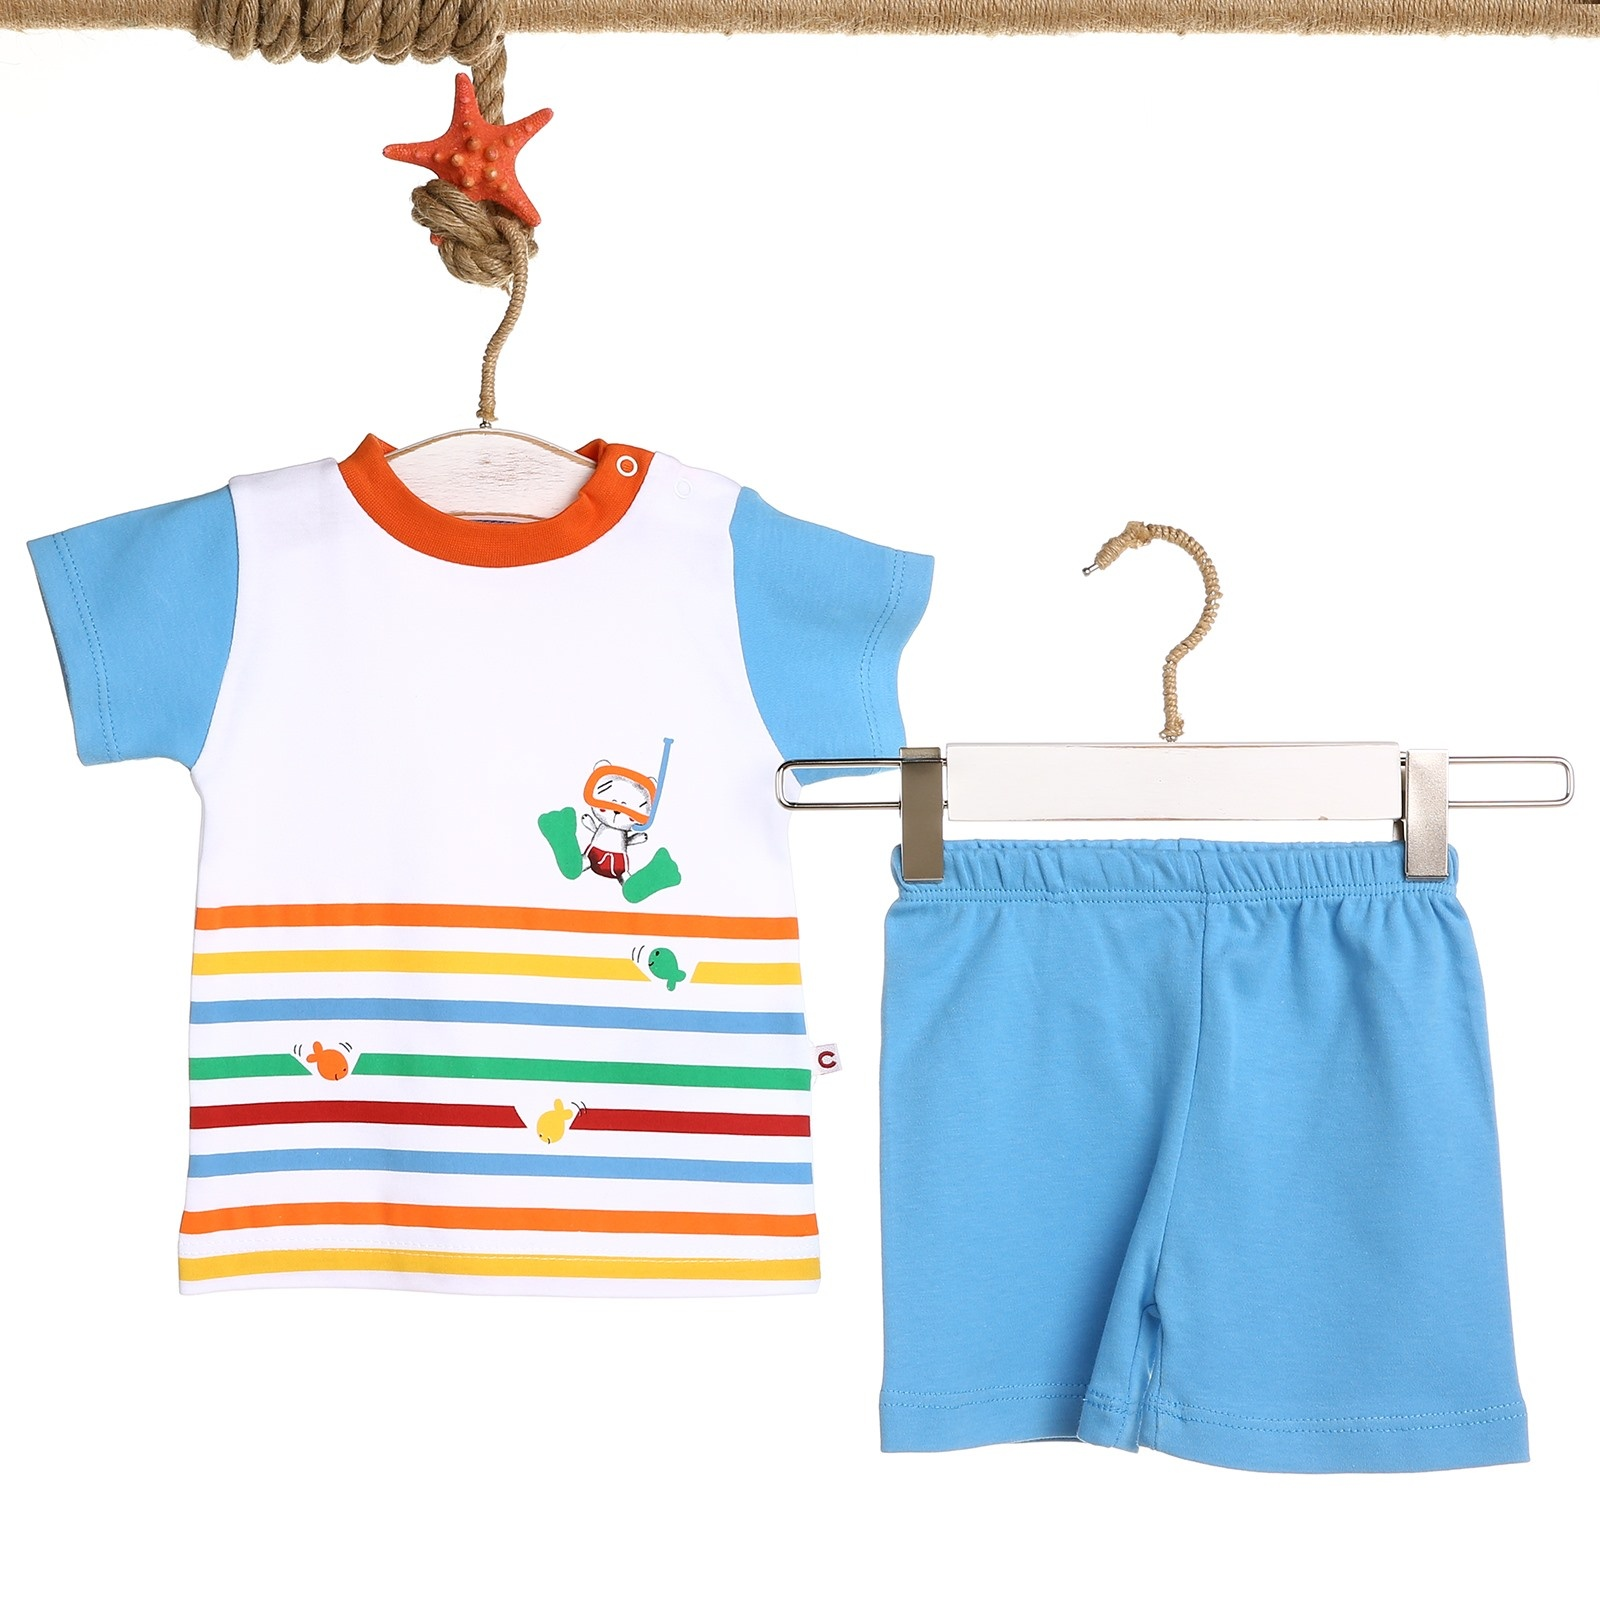 Ebebek Carmin Baby Boy Colored Printed Tshirt Short